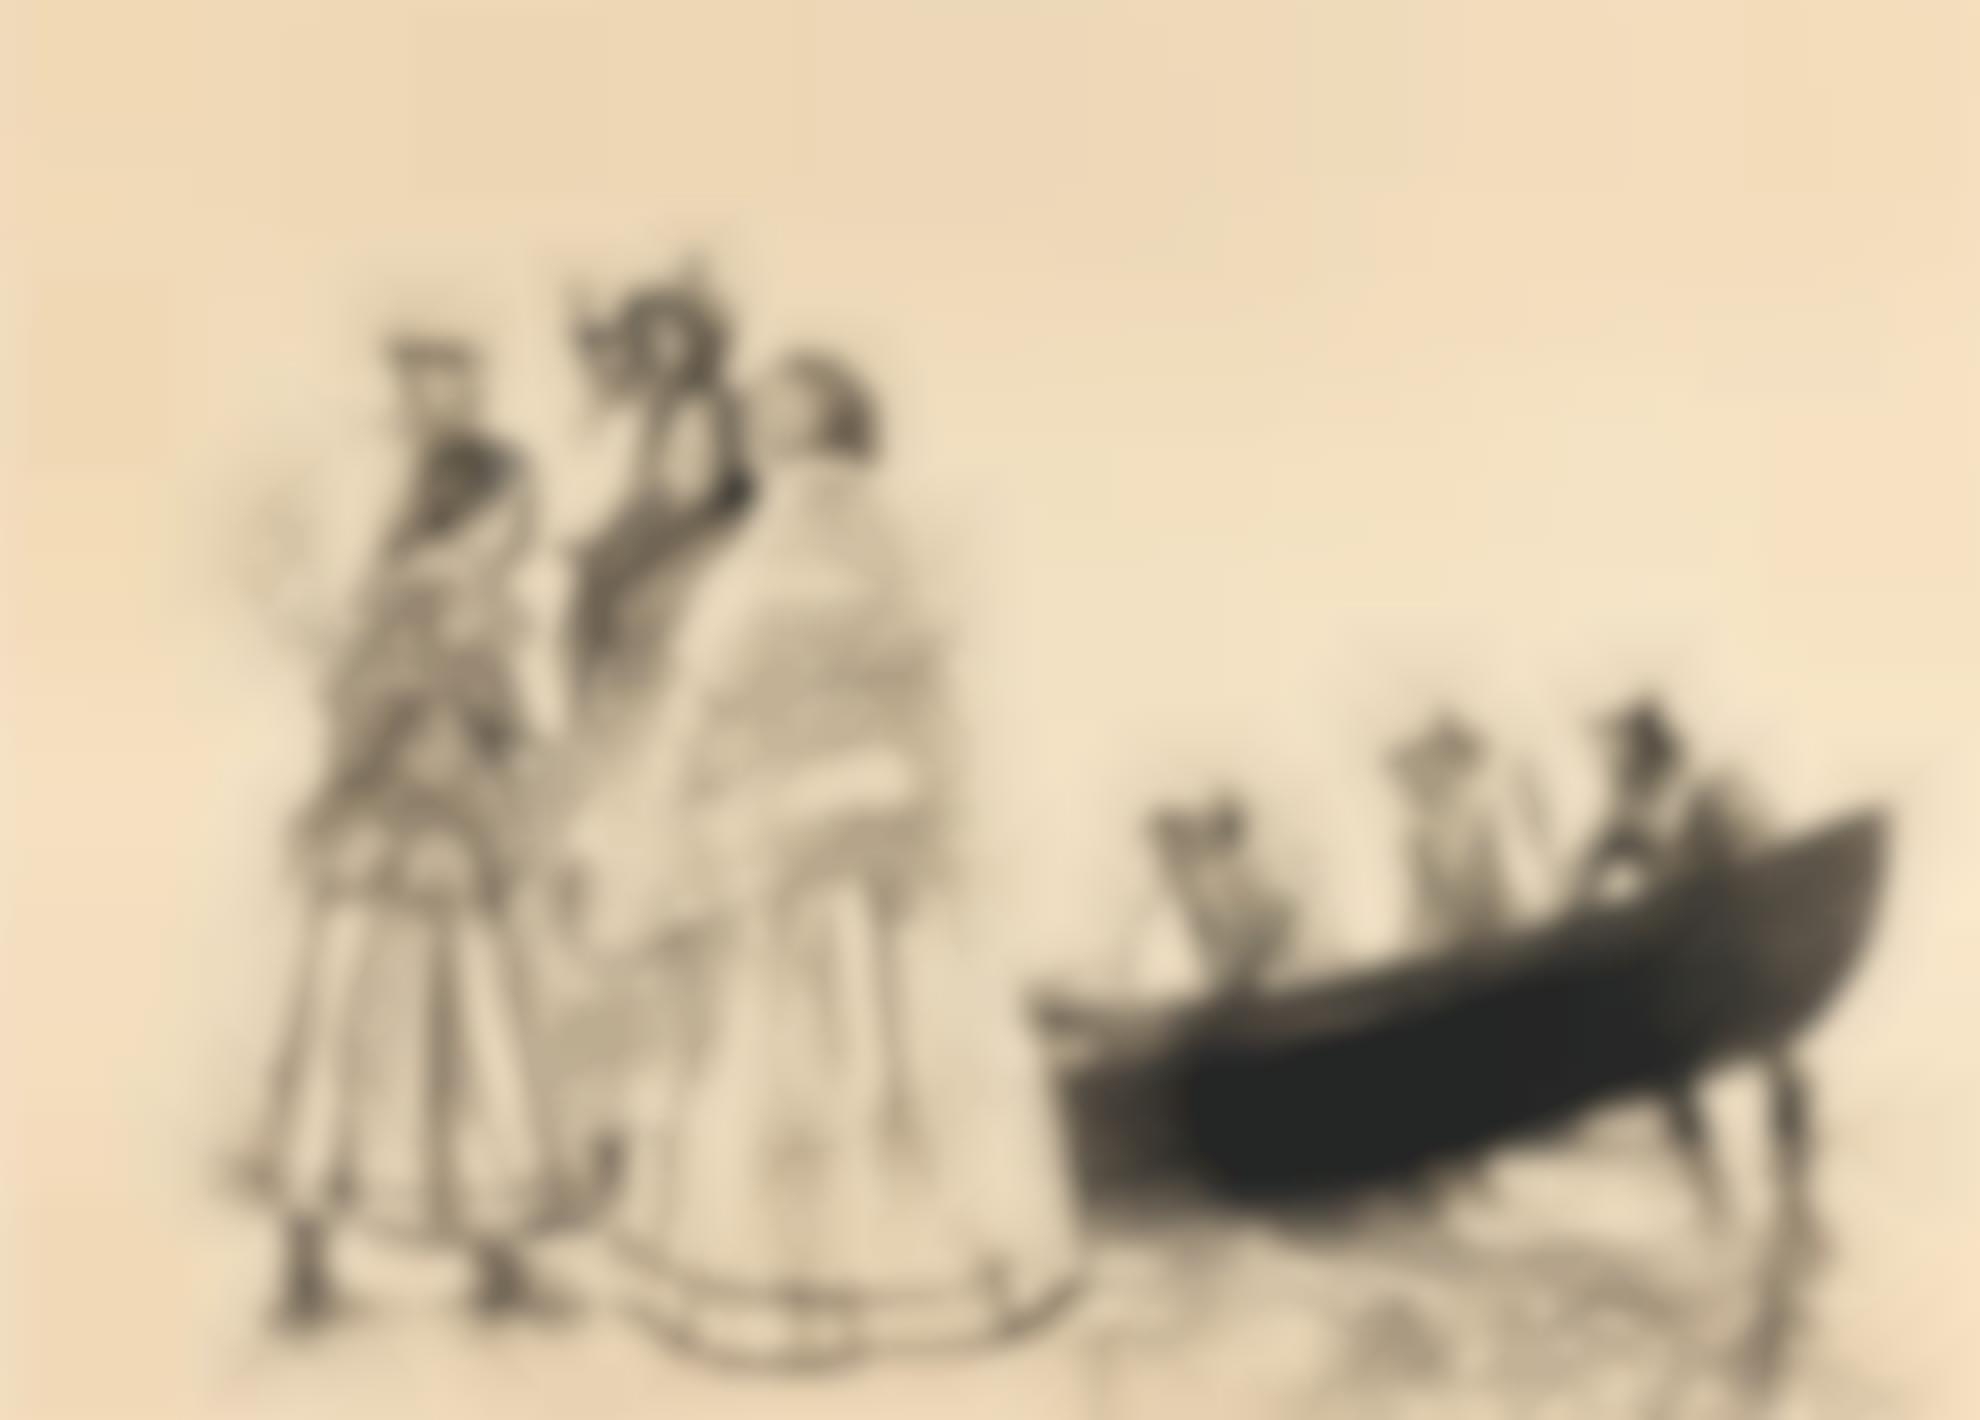 Sean Keating P.R.H.A. - Boatmen Of The Aran Islands-